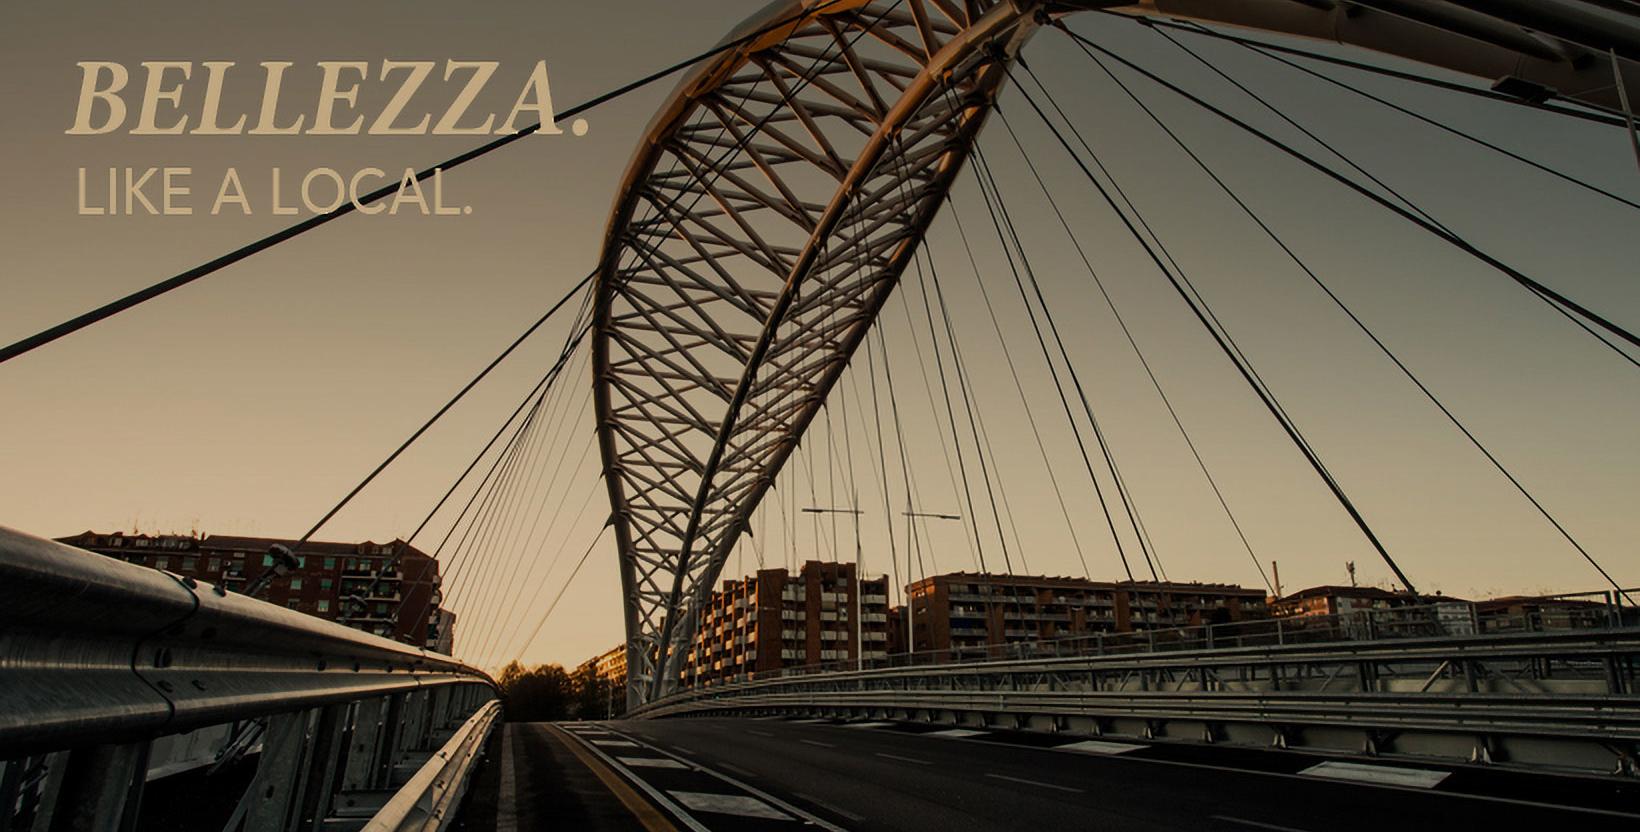 https://localike-roma.com/wp-content/uploads/2020/10/localike-roma-bellezza-Ponte-Settimia-Spizzichino-aspect-ratio-1640-832.jpg